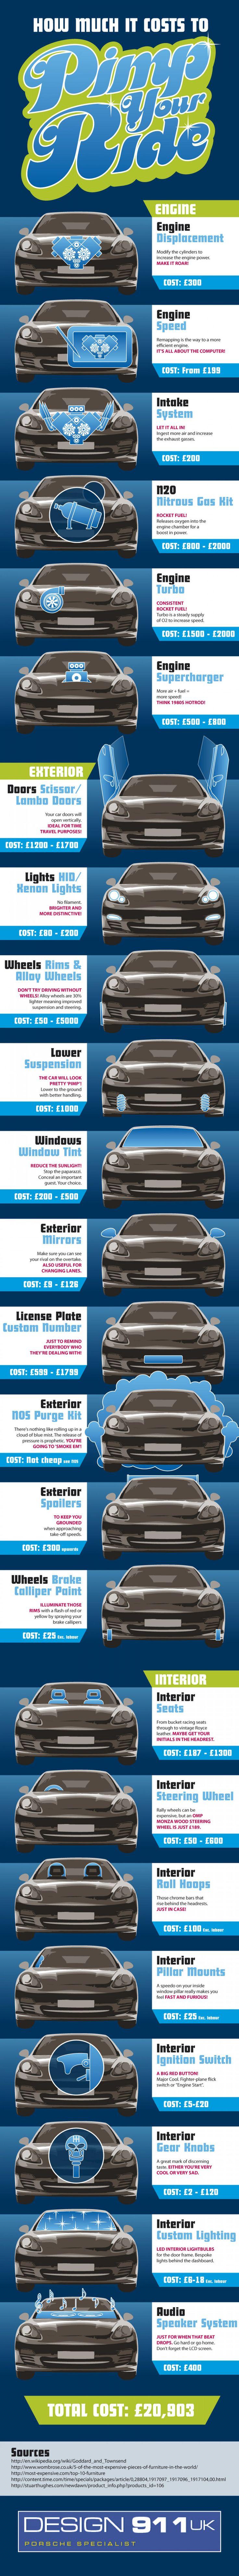 new cdl ferrari from school sport styles of psds porsche prices car driving